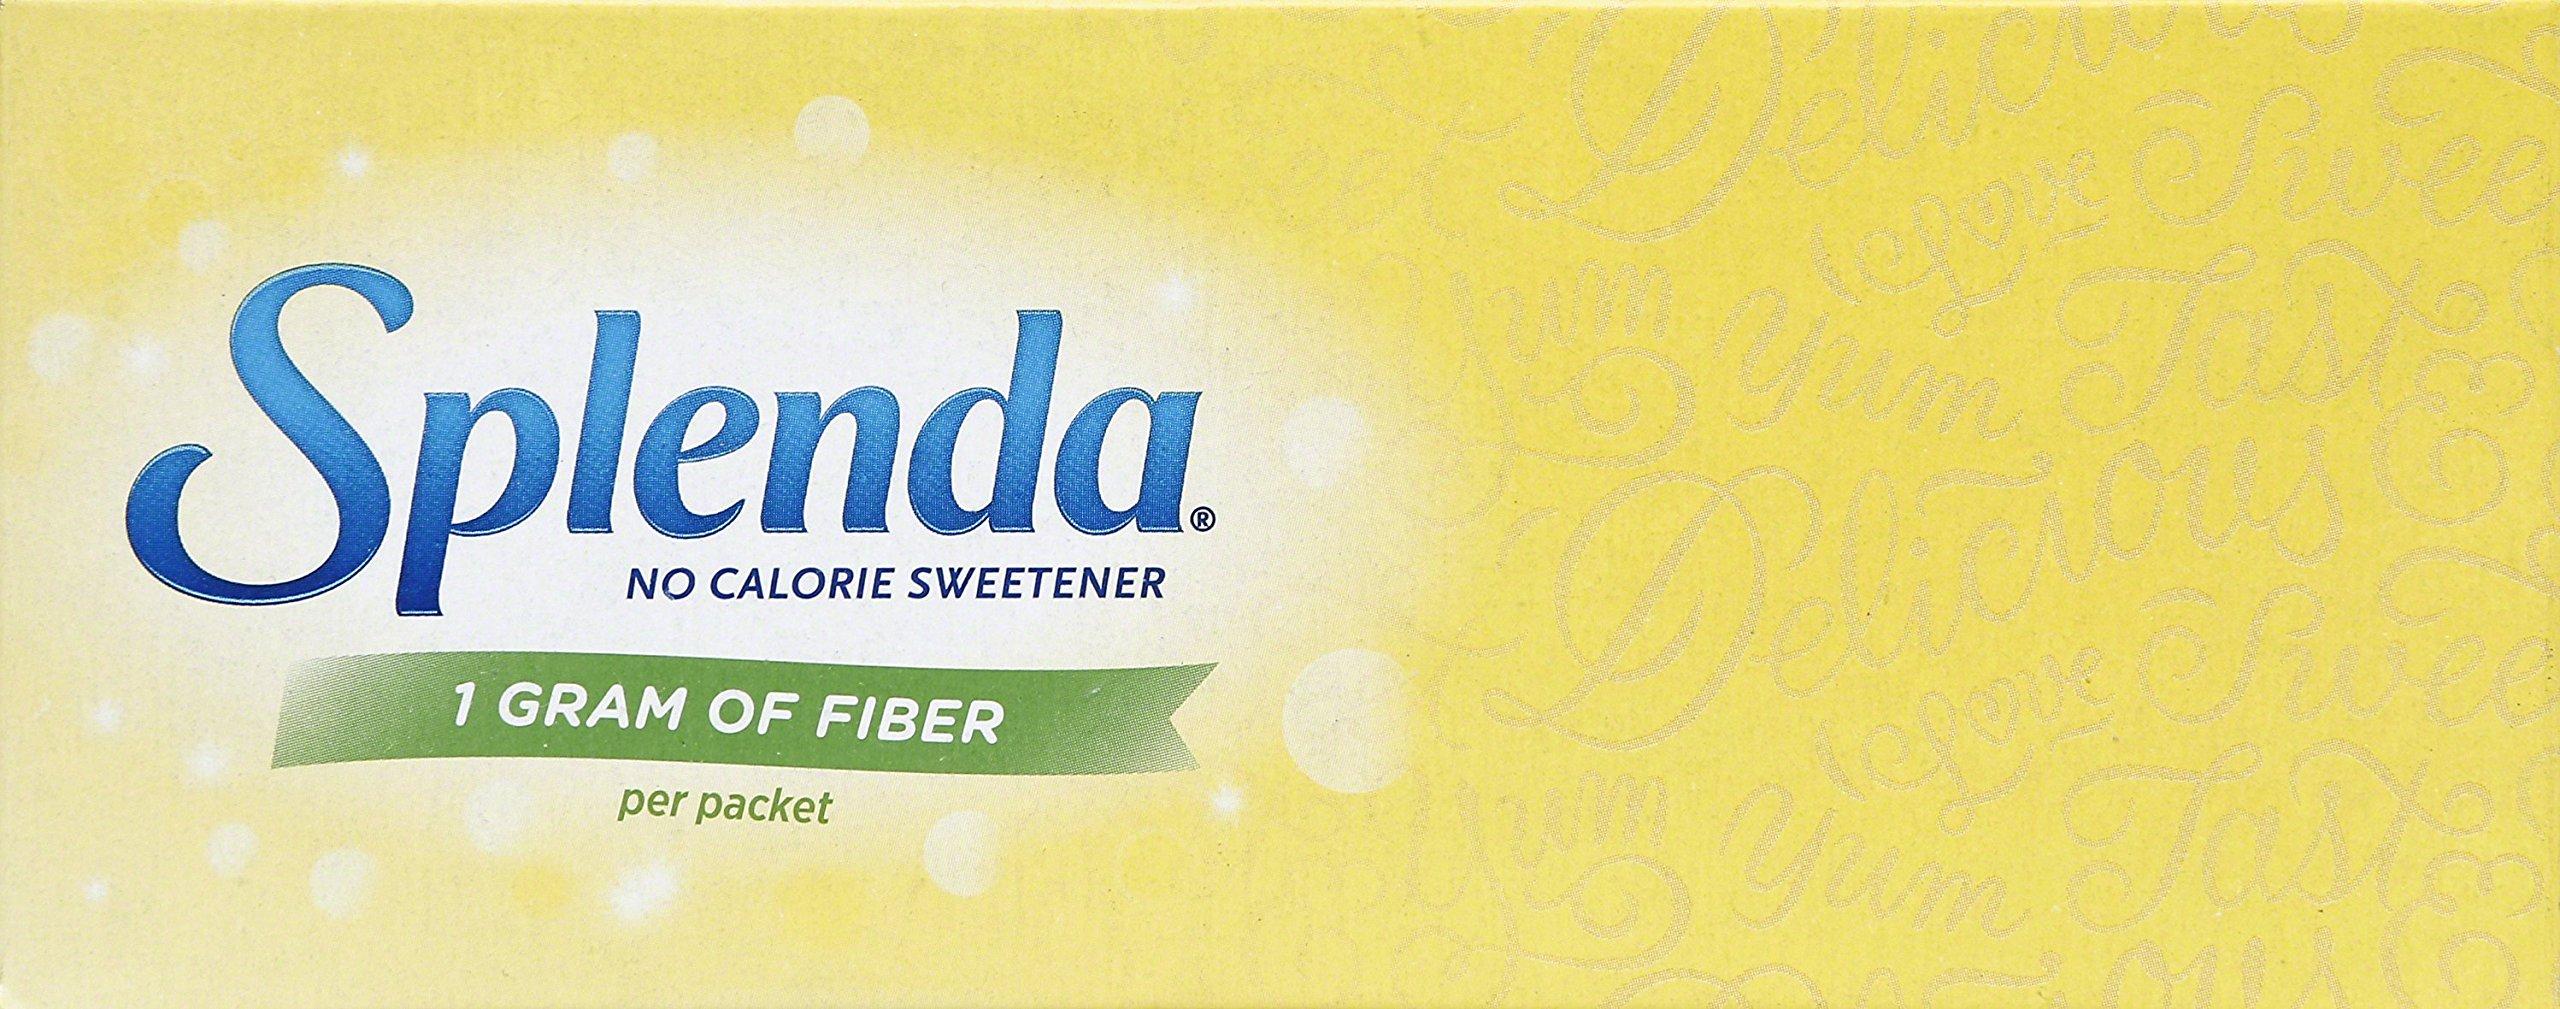 JOJ201800   Splenda No Calorie Sweetener with Fiber, Yellow, 80 Count (1G Fiber) by Splenda (Image #5)